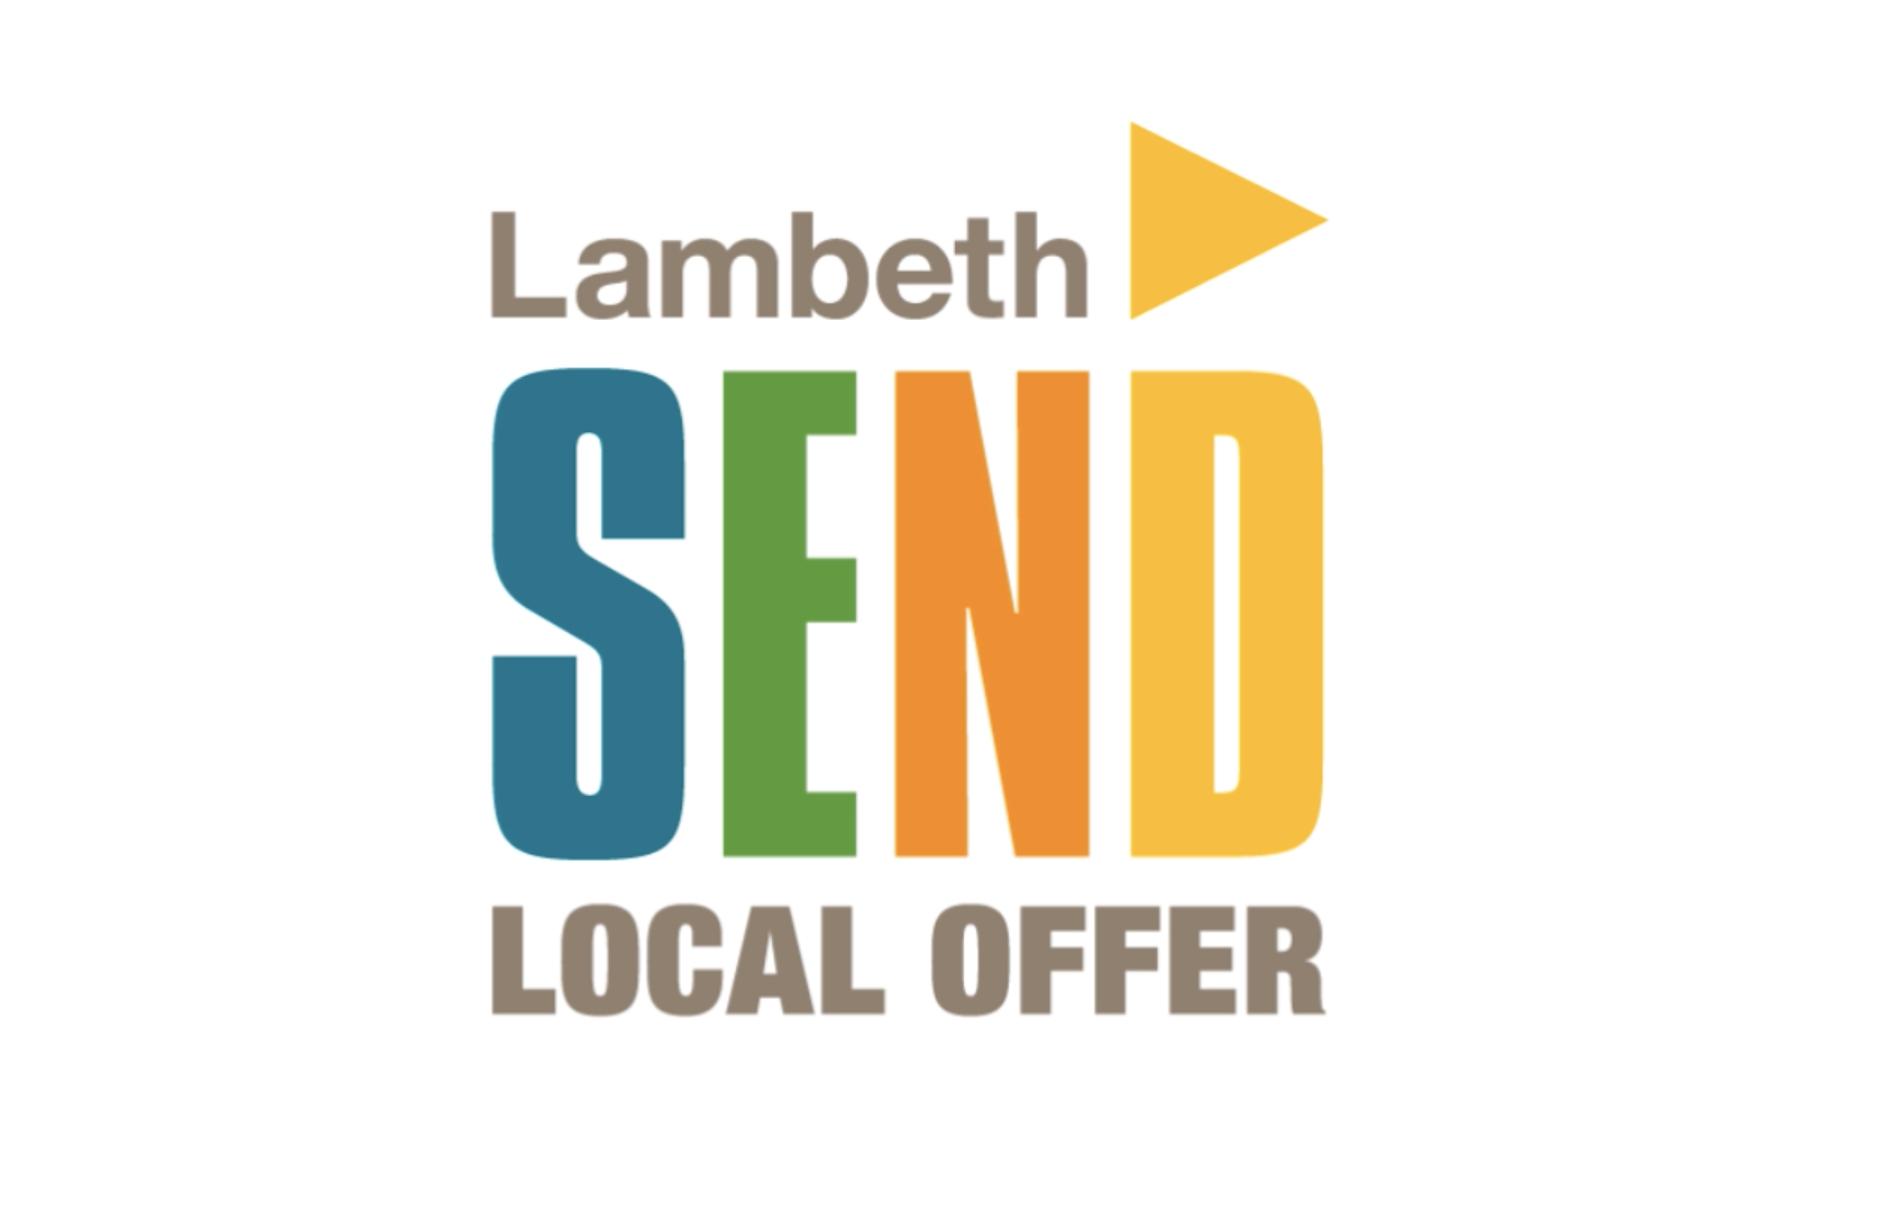 Lambeth Send Local Offer